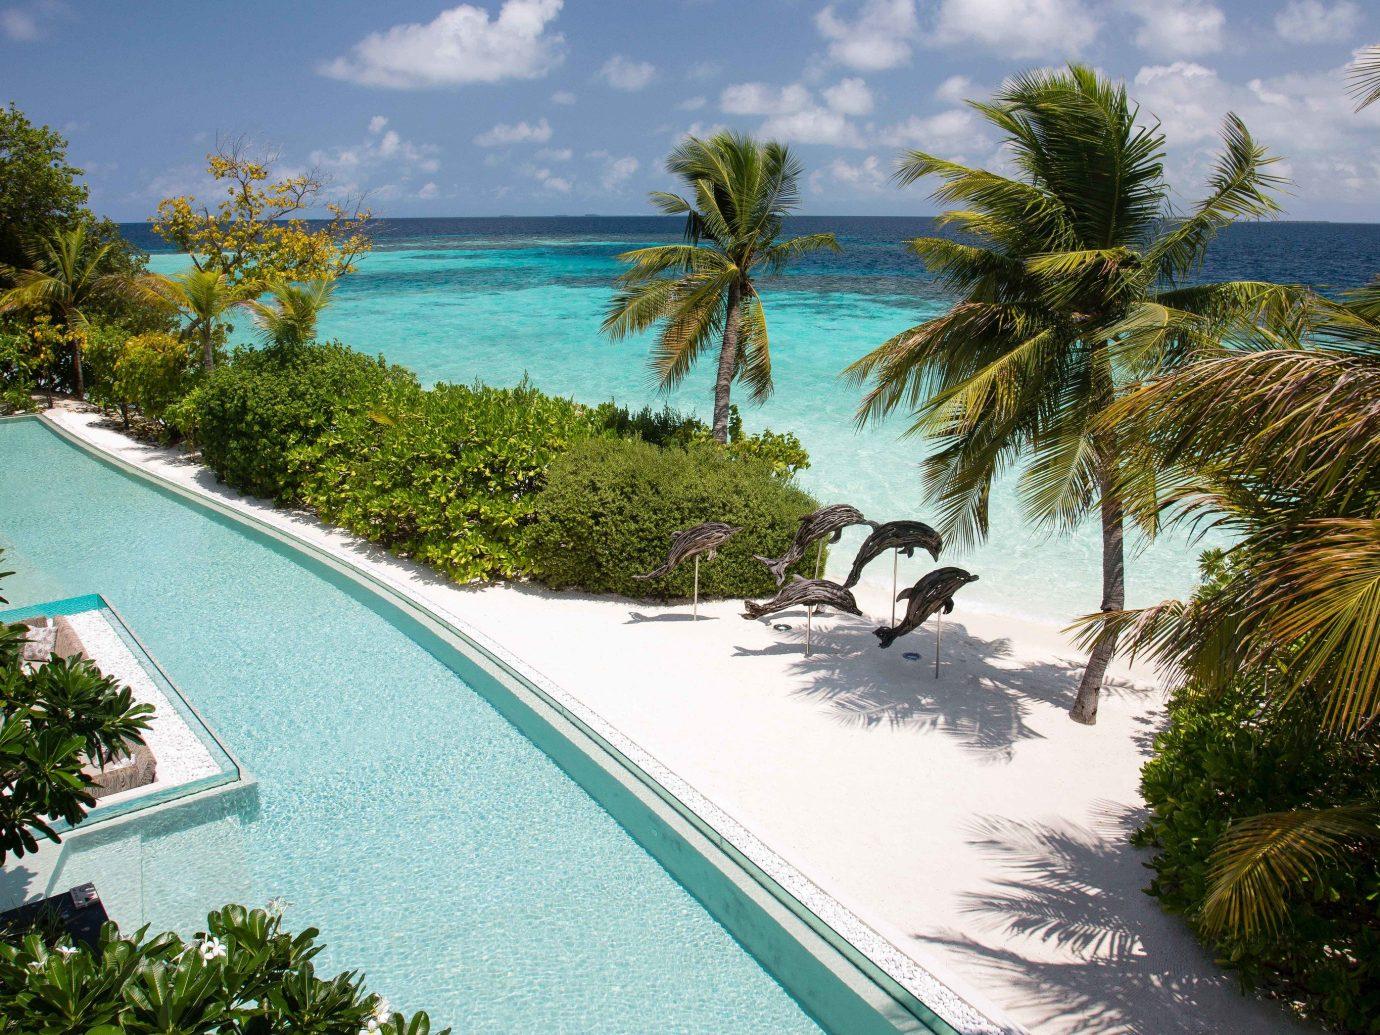 Pool and beach at Coco Privé, Maldives